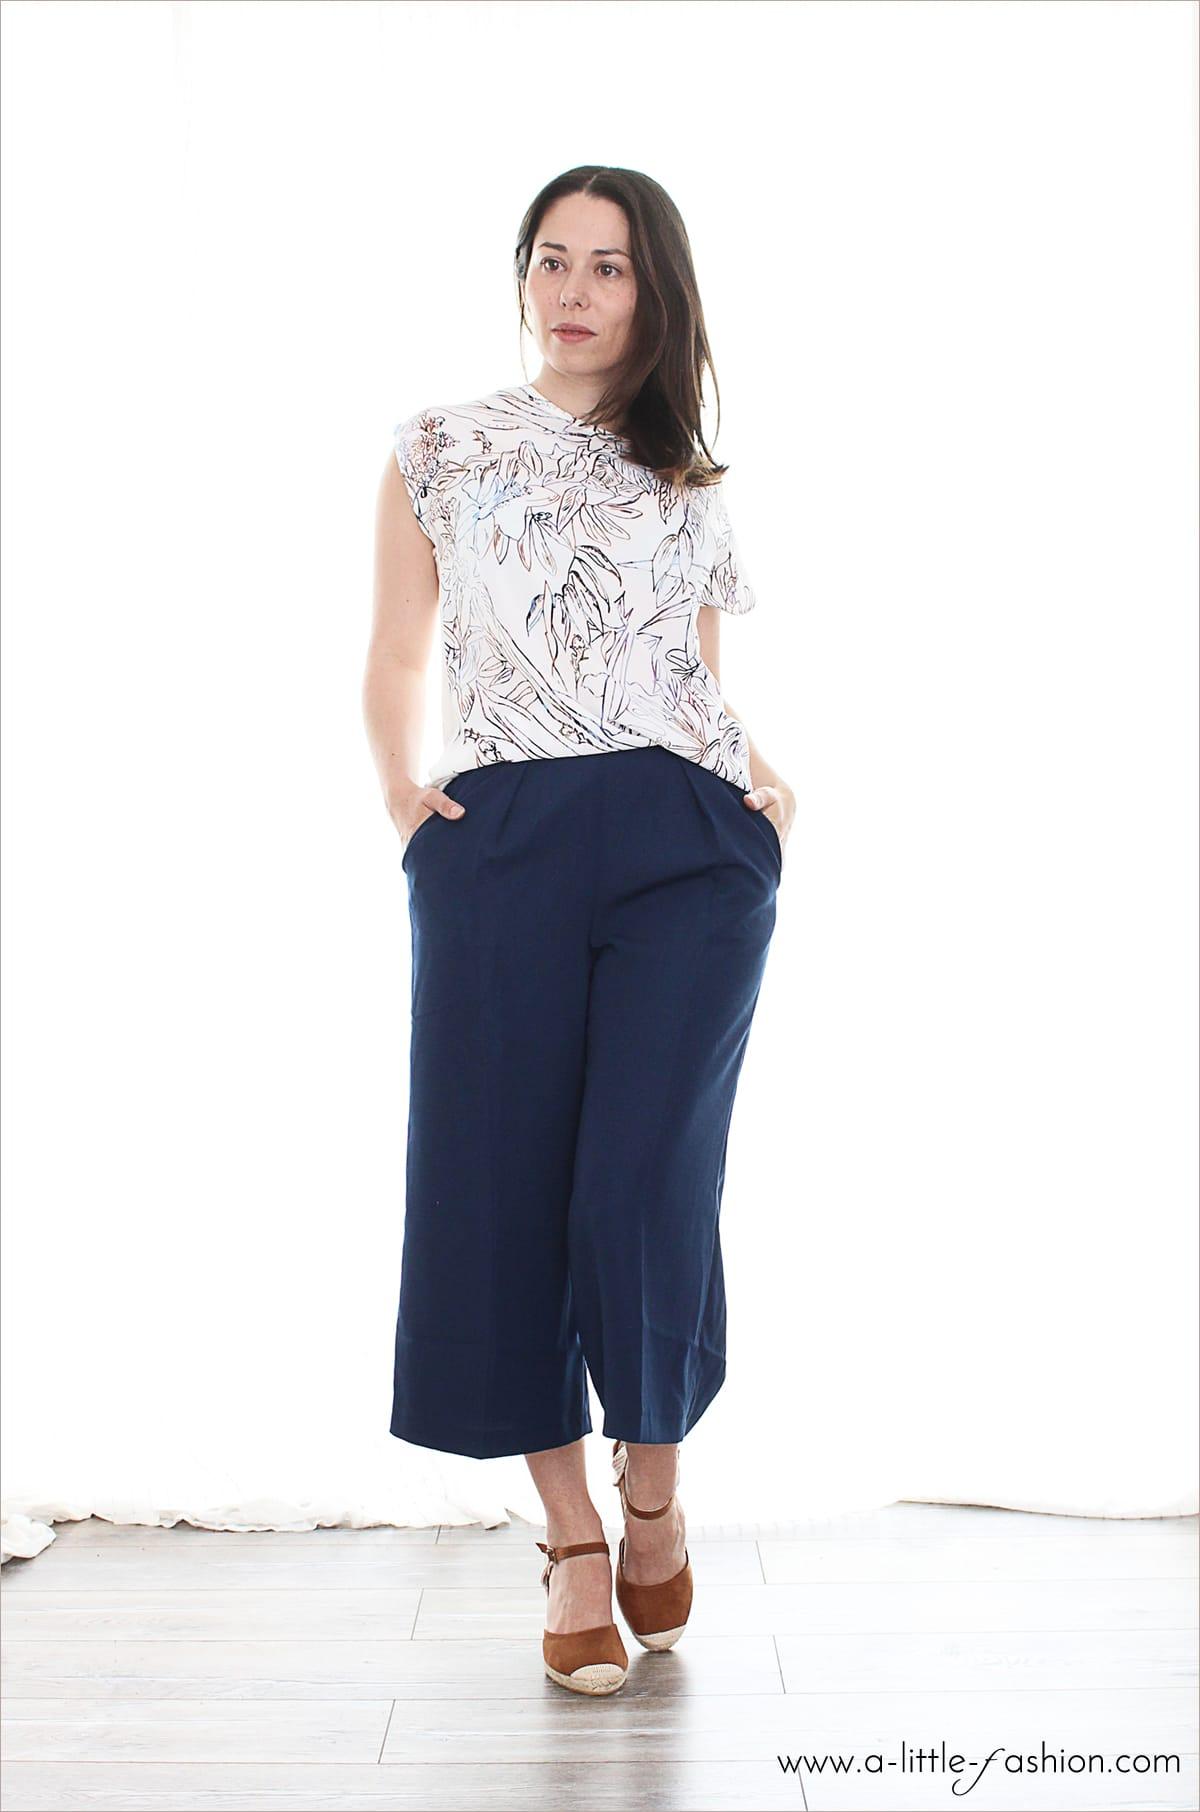 sommer-outfit_culotte_blumen-shirt_blau_wedges_keil-pumps_fashion_style_zalando4-min